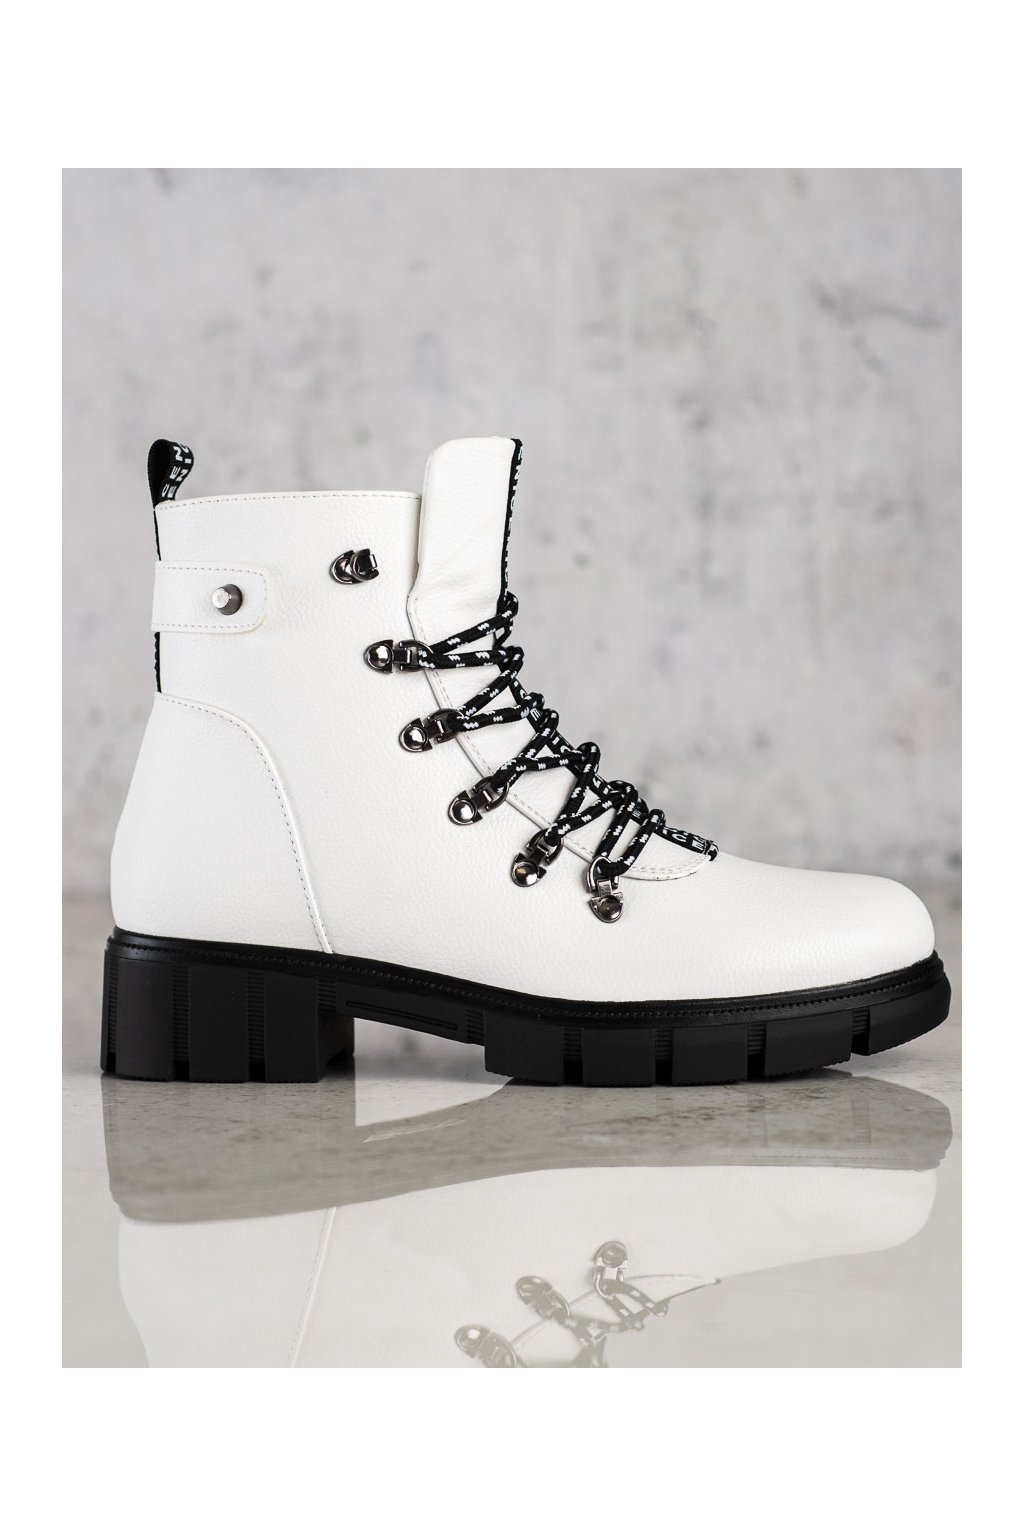 Biele dámske topánky Vinceza kod HX22-16284W